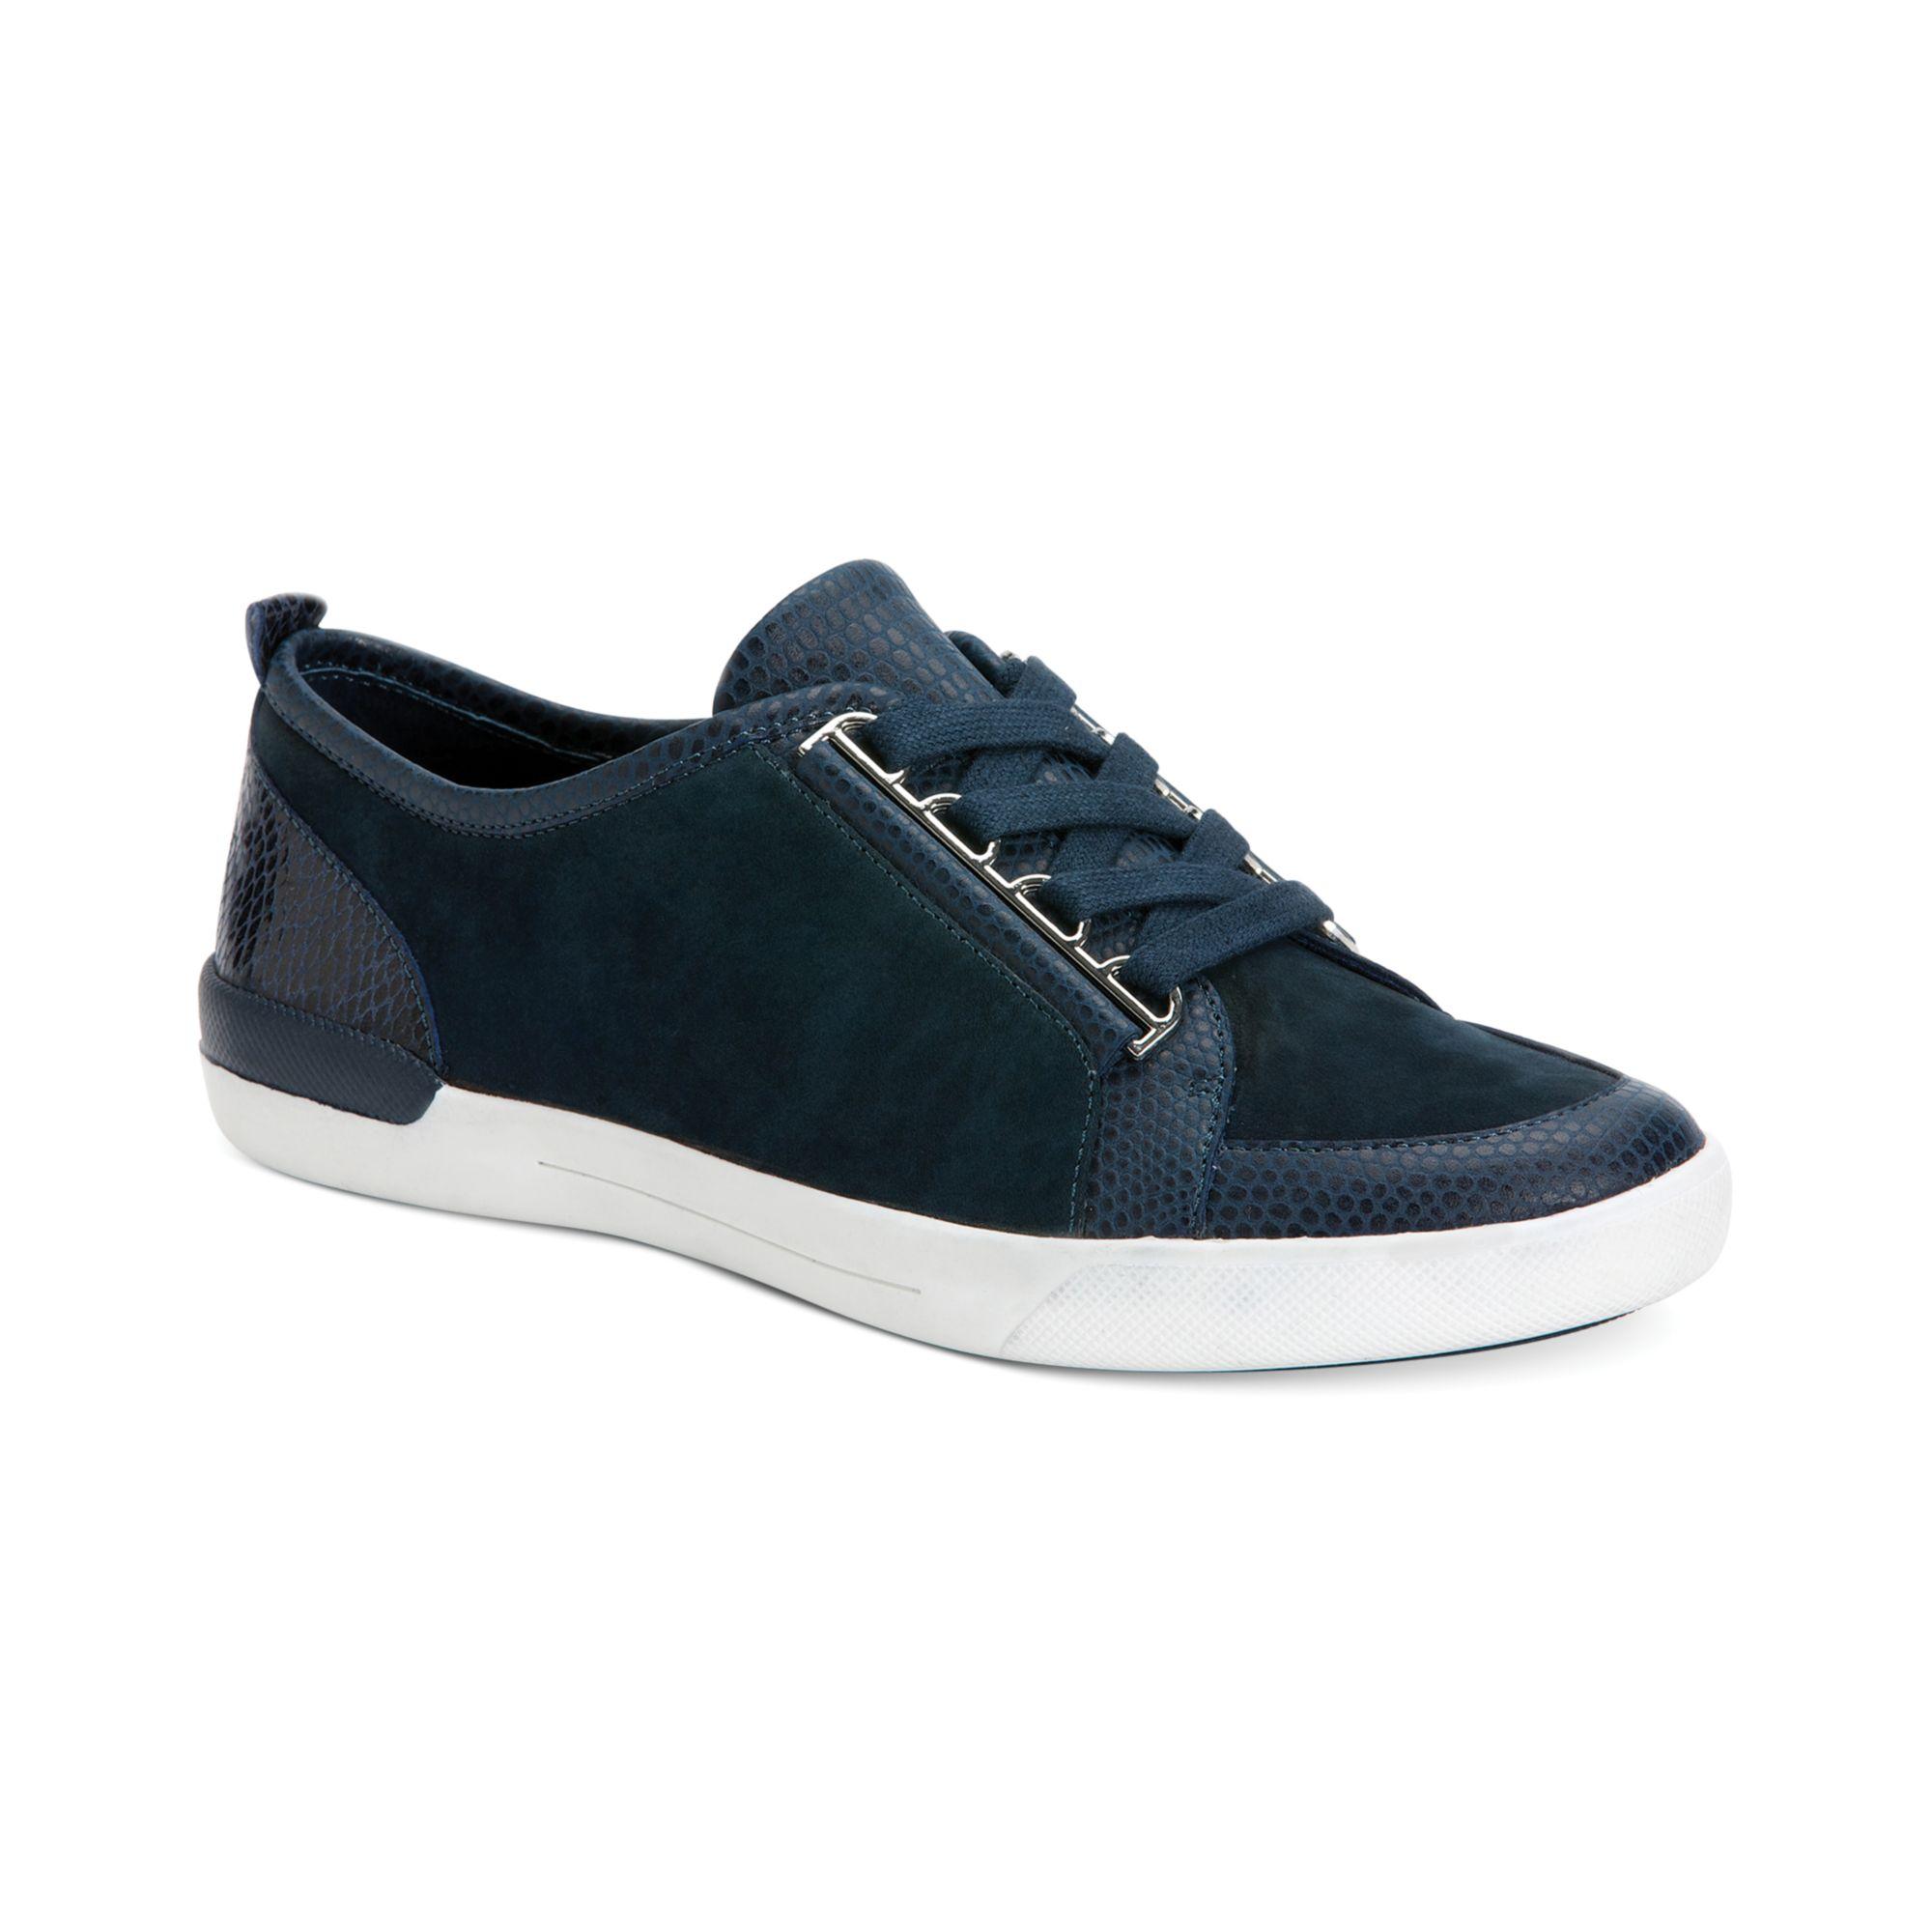 calvin klein women 39 s tanita sneakers in blue indigo lyst. Black Bedroom Furniture Sets. Home Design Ideas